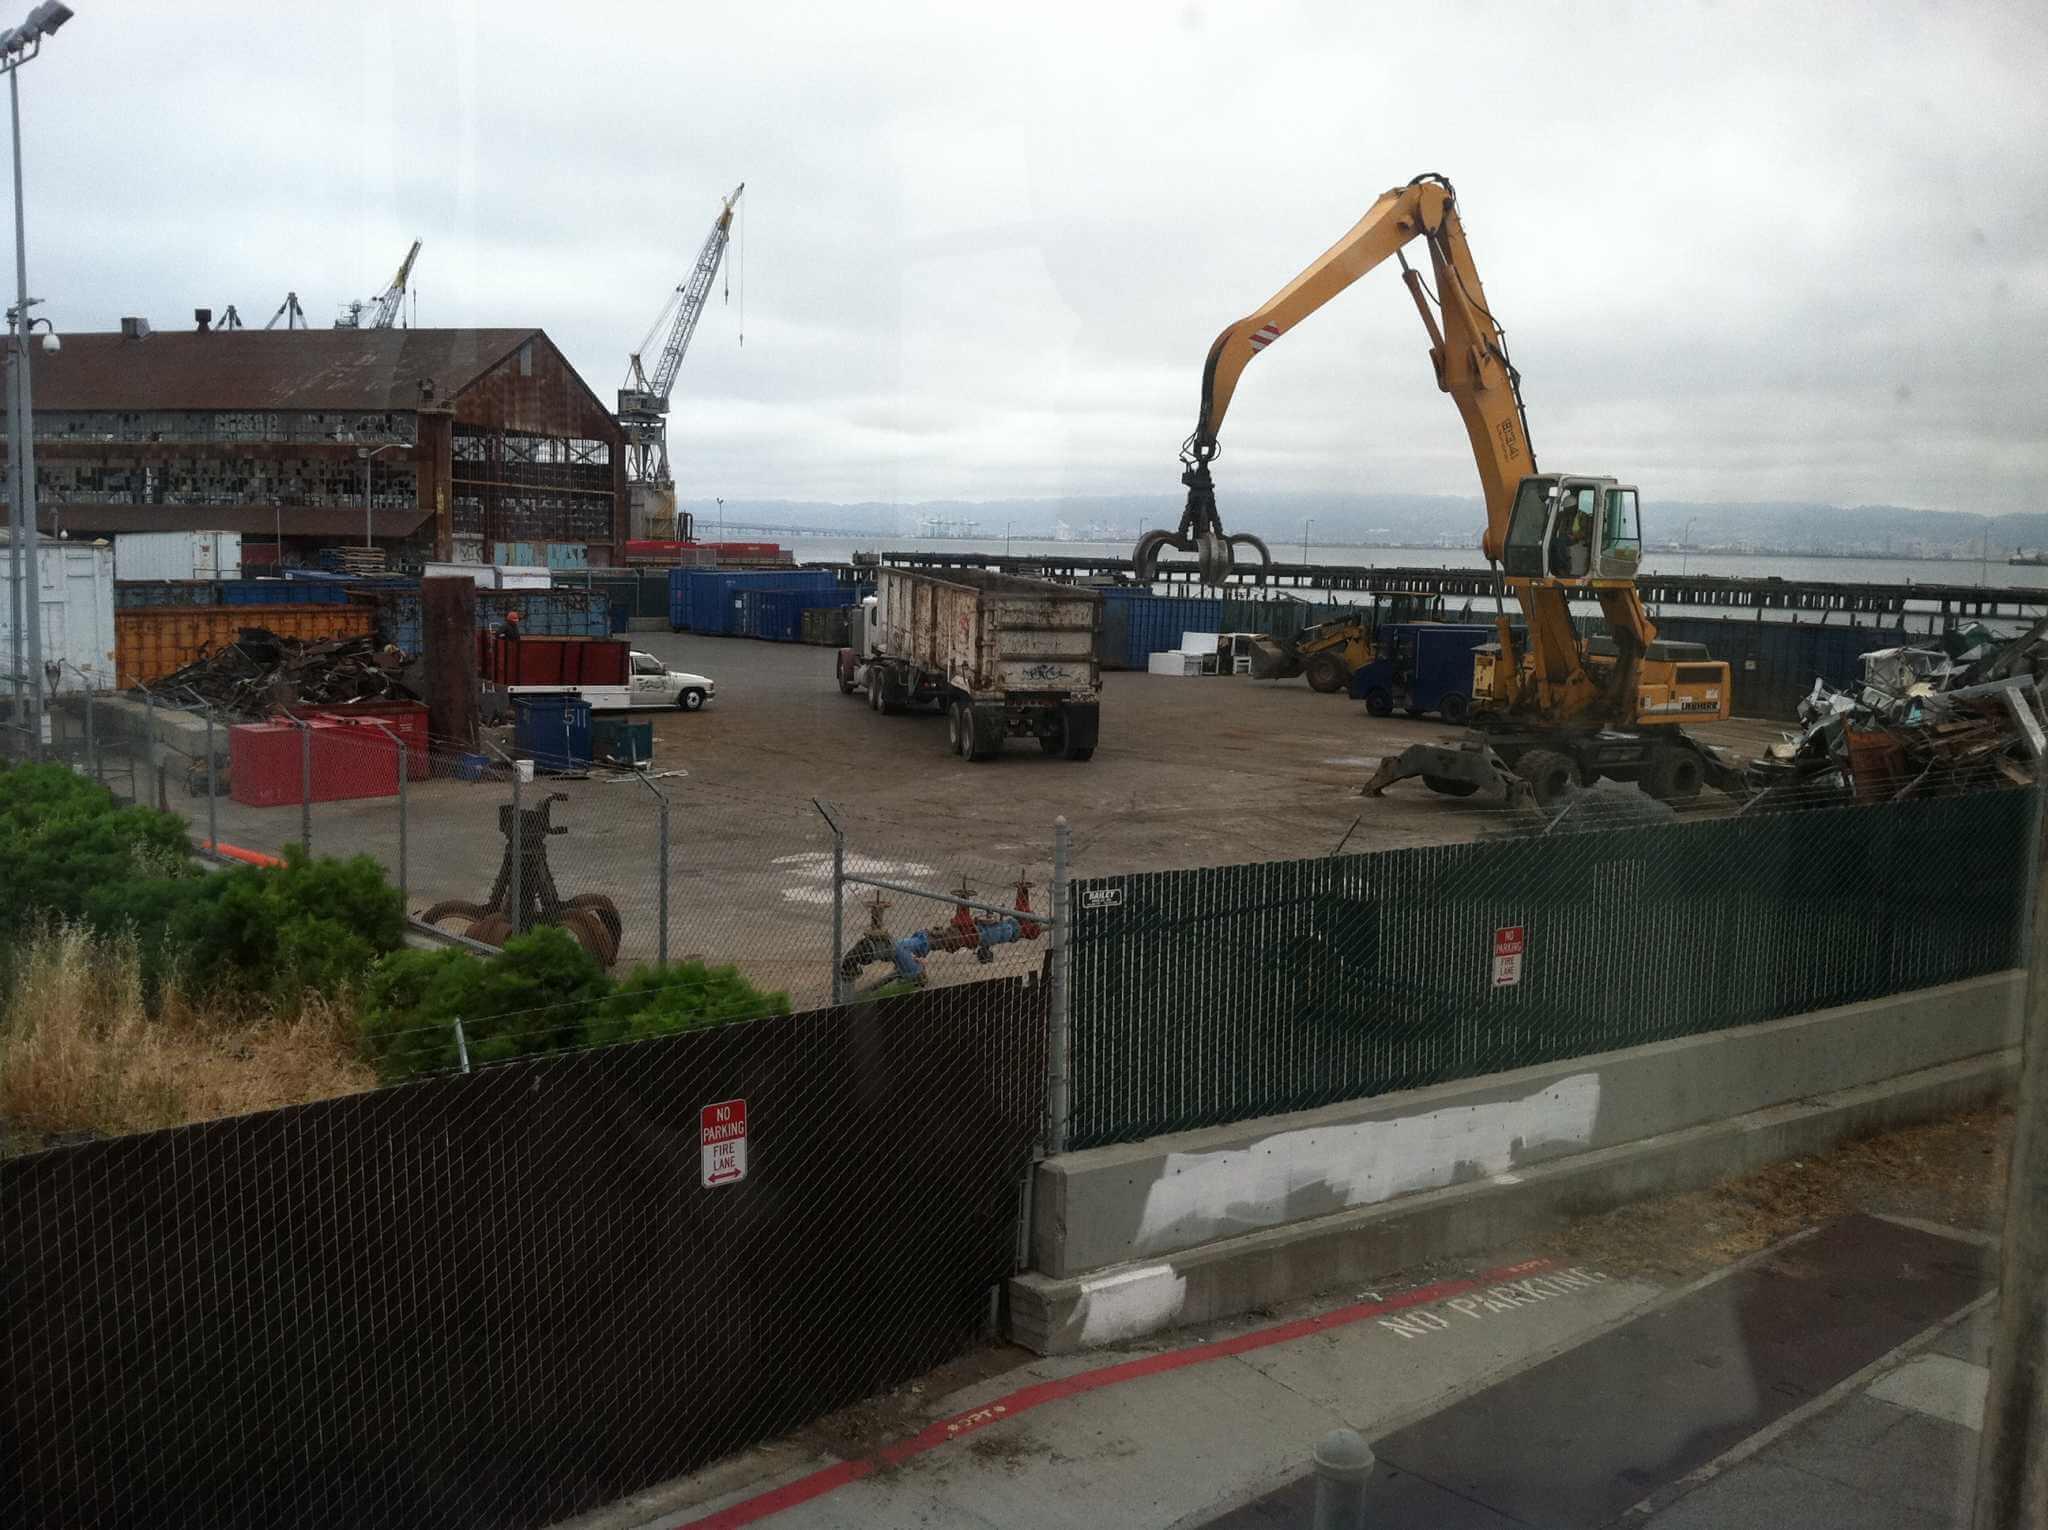 Pier 70 shipyard